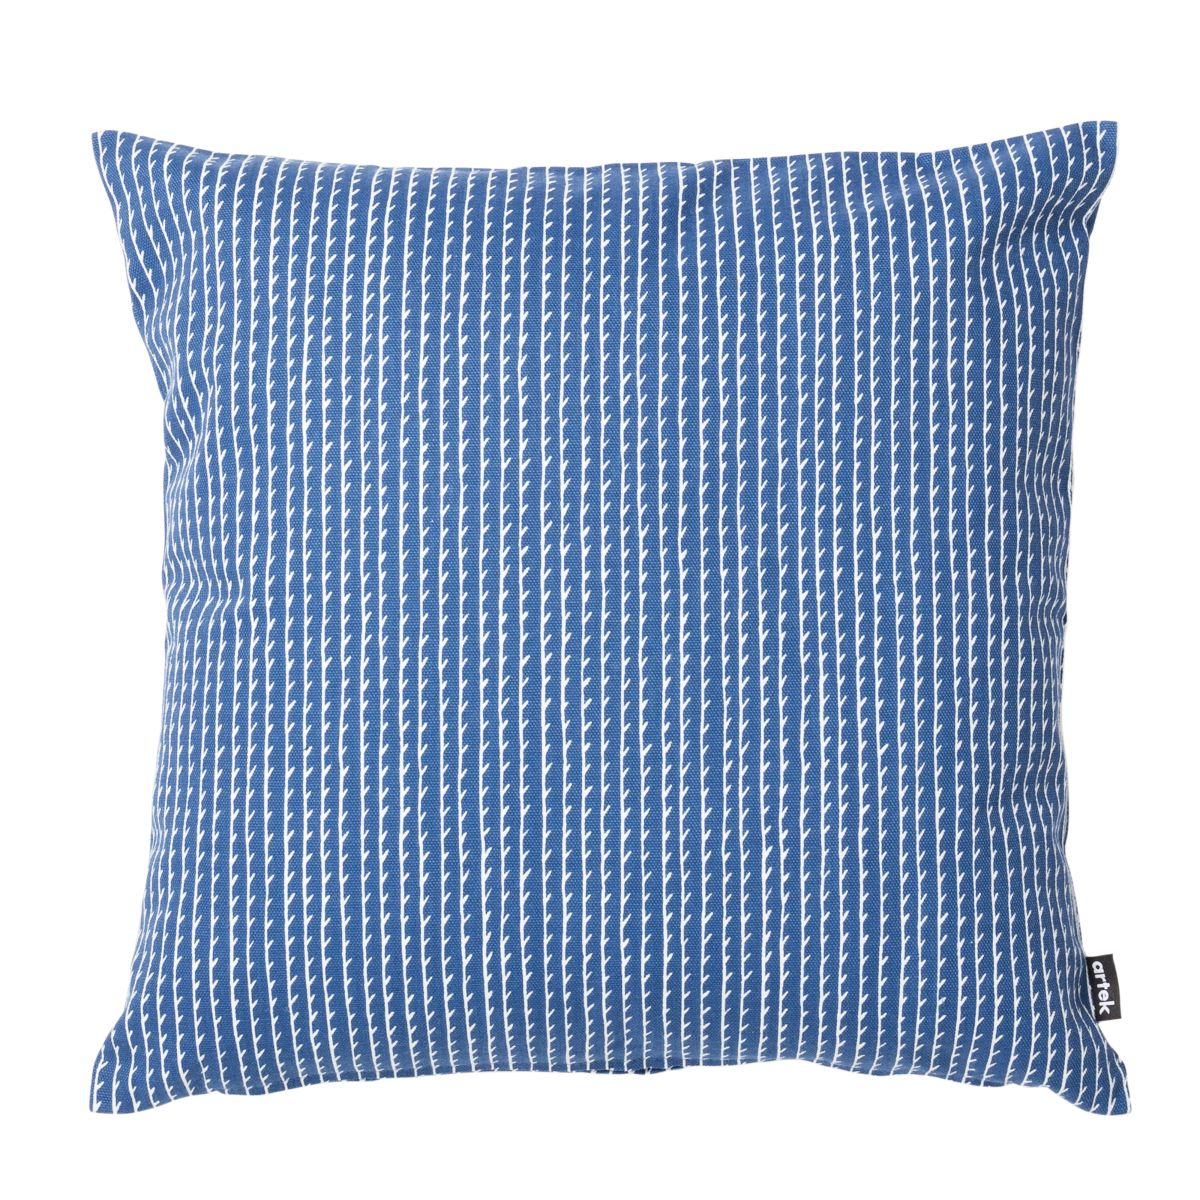 Rivi-Cushion-Cover-Blue-_-White-Large_F_Web-2410977